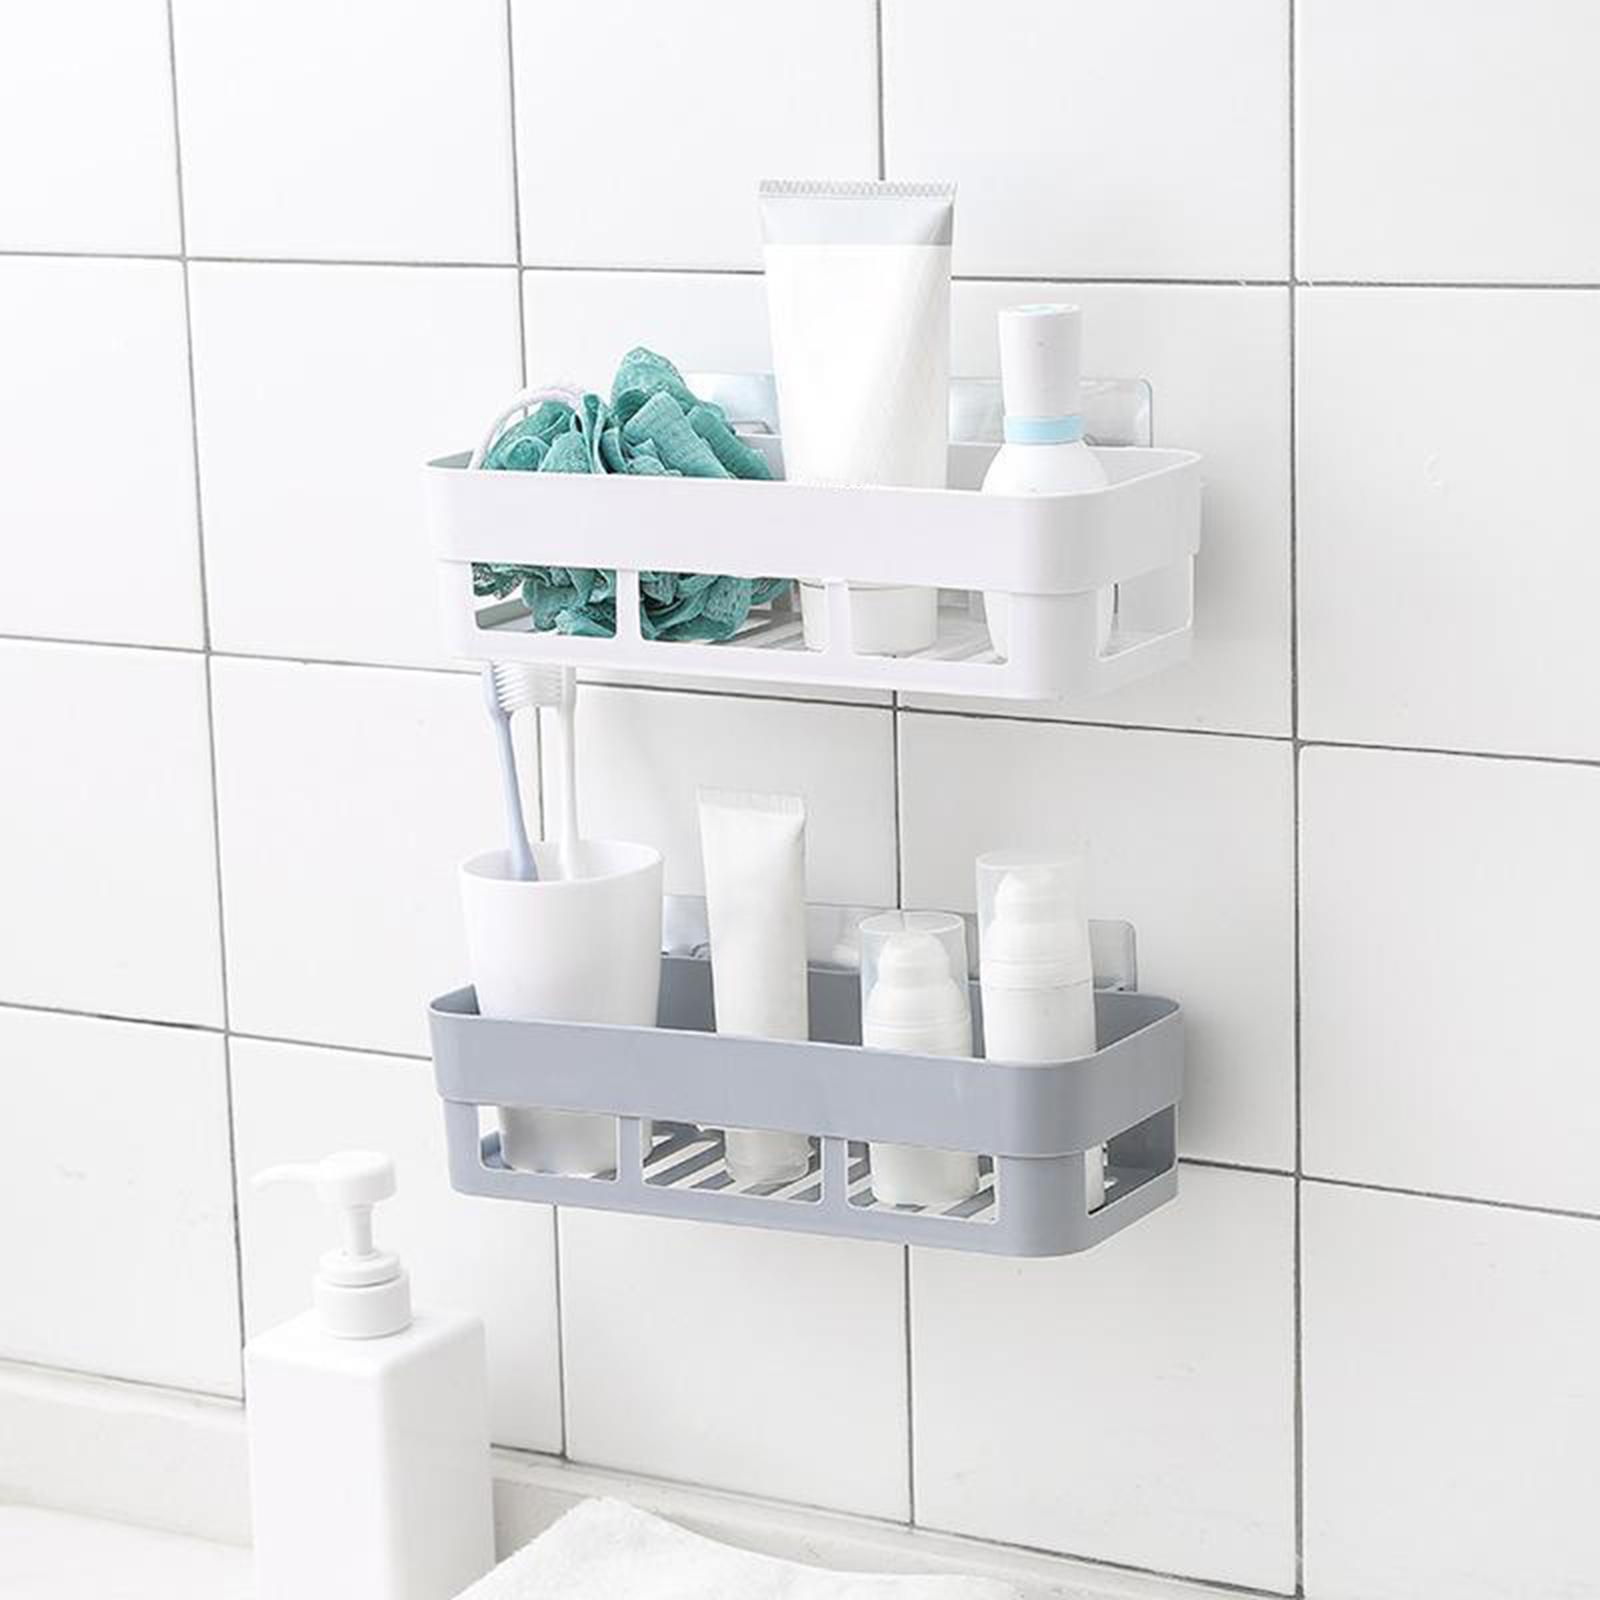 thumbnail 13 - Self-Adhesive-Shower-Shelf-Plastic-Shower-Caddy-Organiser-Bathroom-Shelf